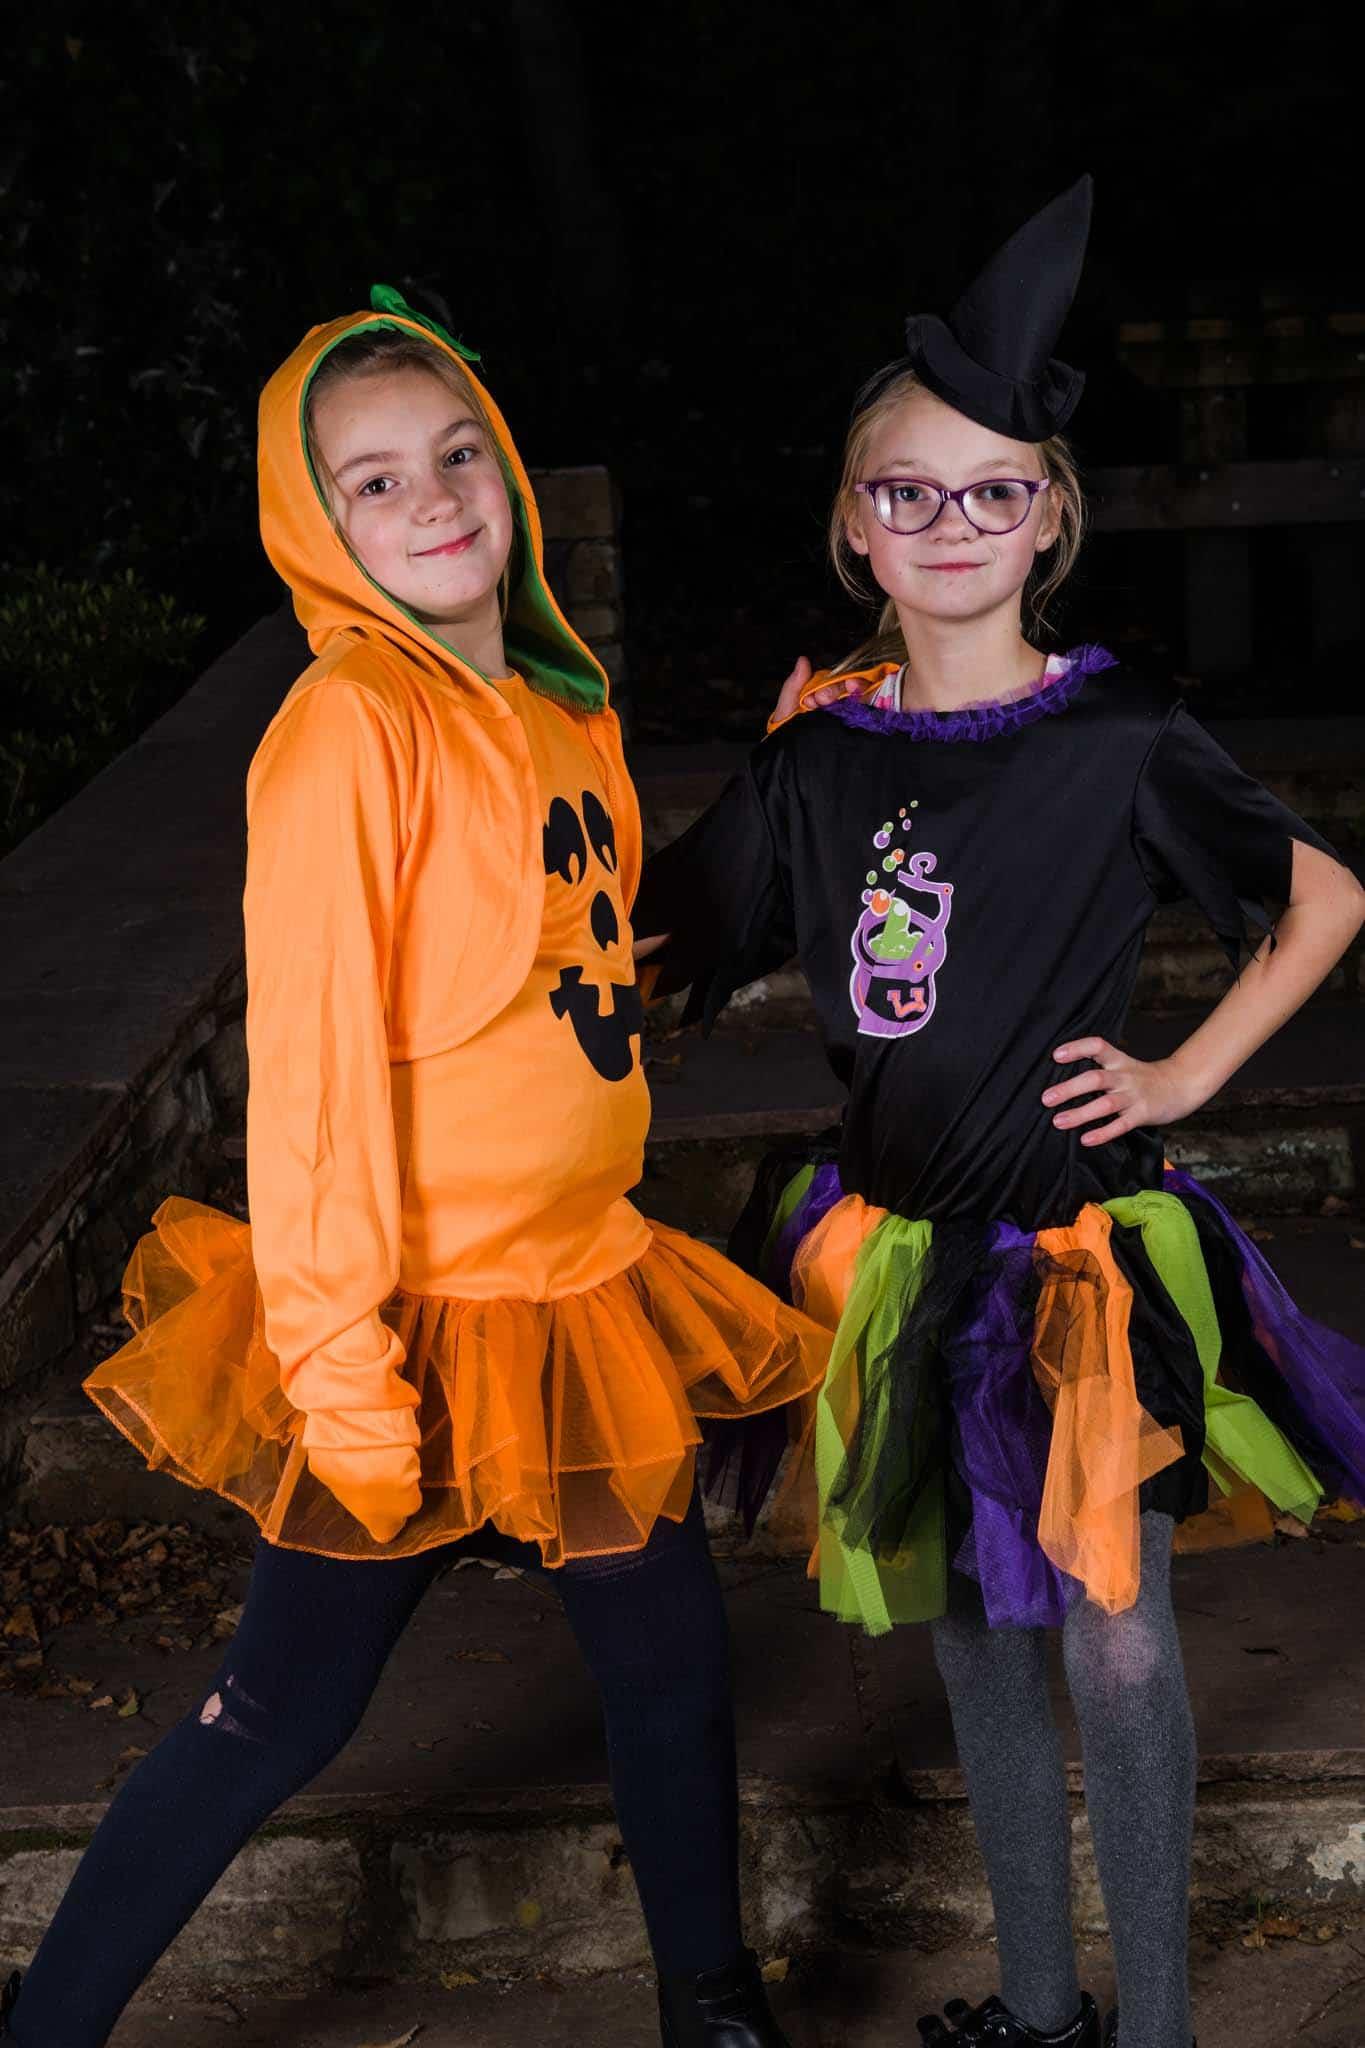 Funidelia brilliant halloween costume ideas for girls � the